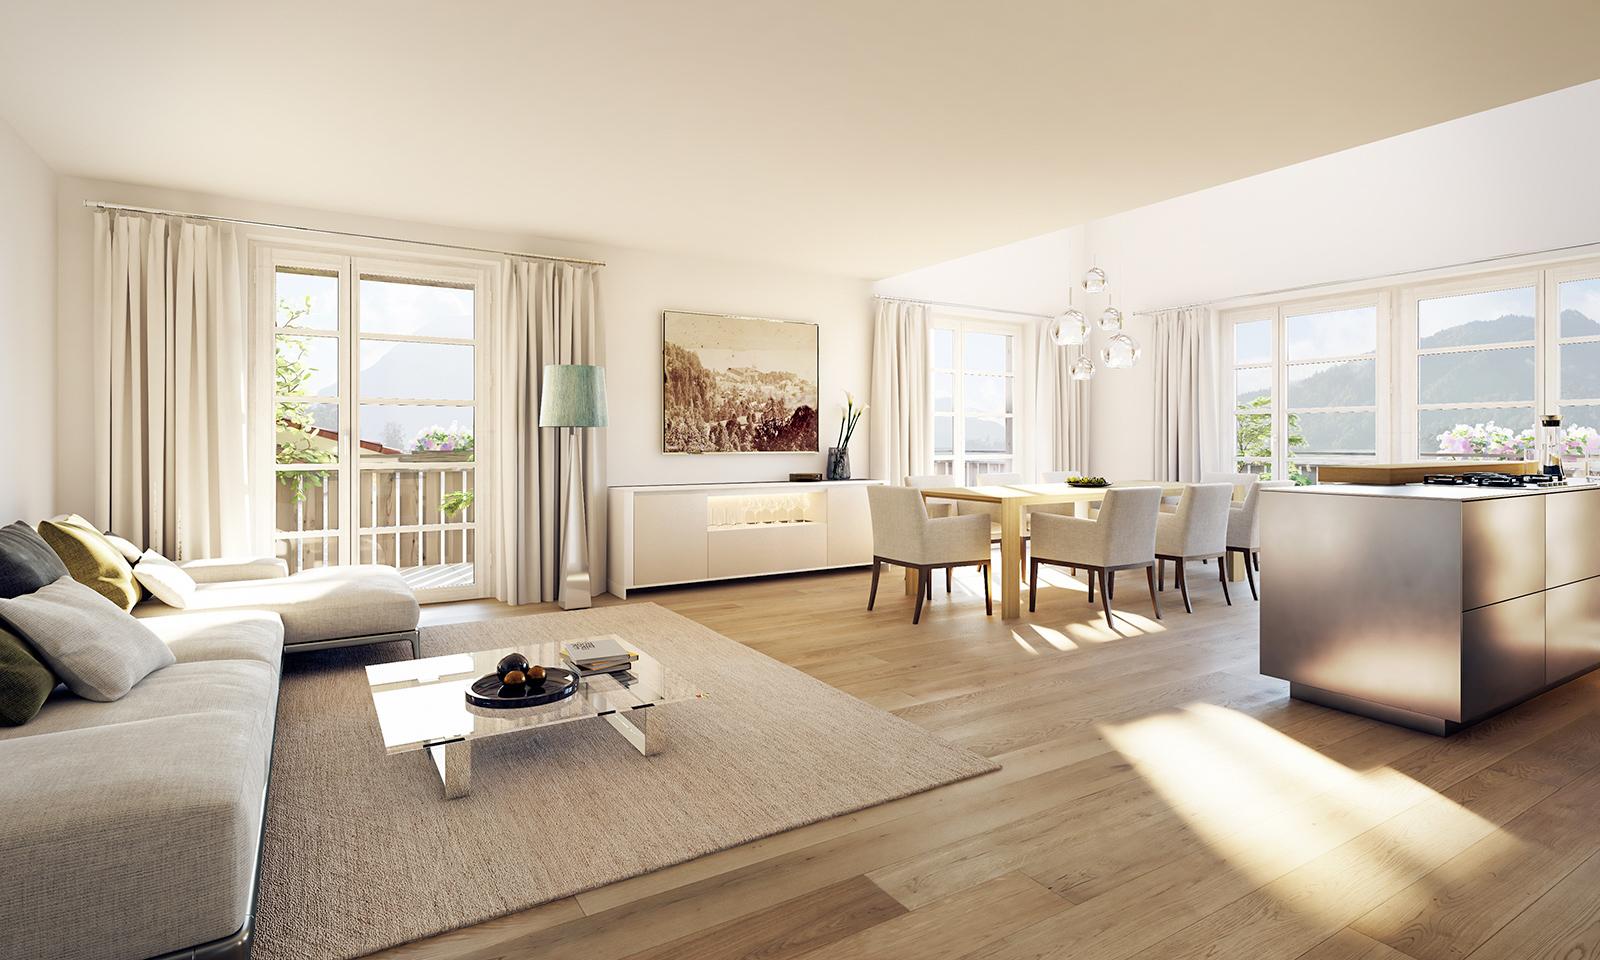 tegernsee-penthouse-kaufen-interior-quartier.jpg